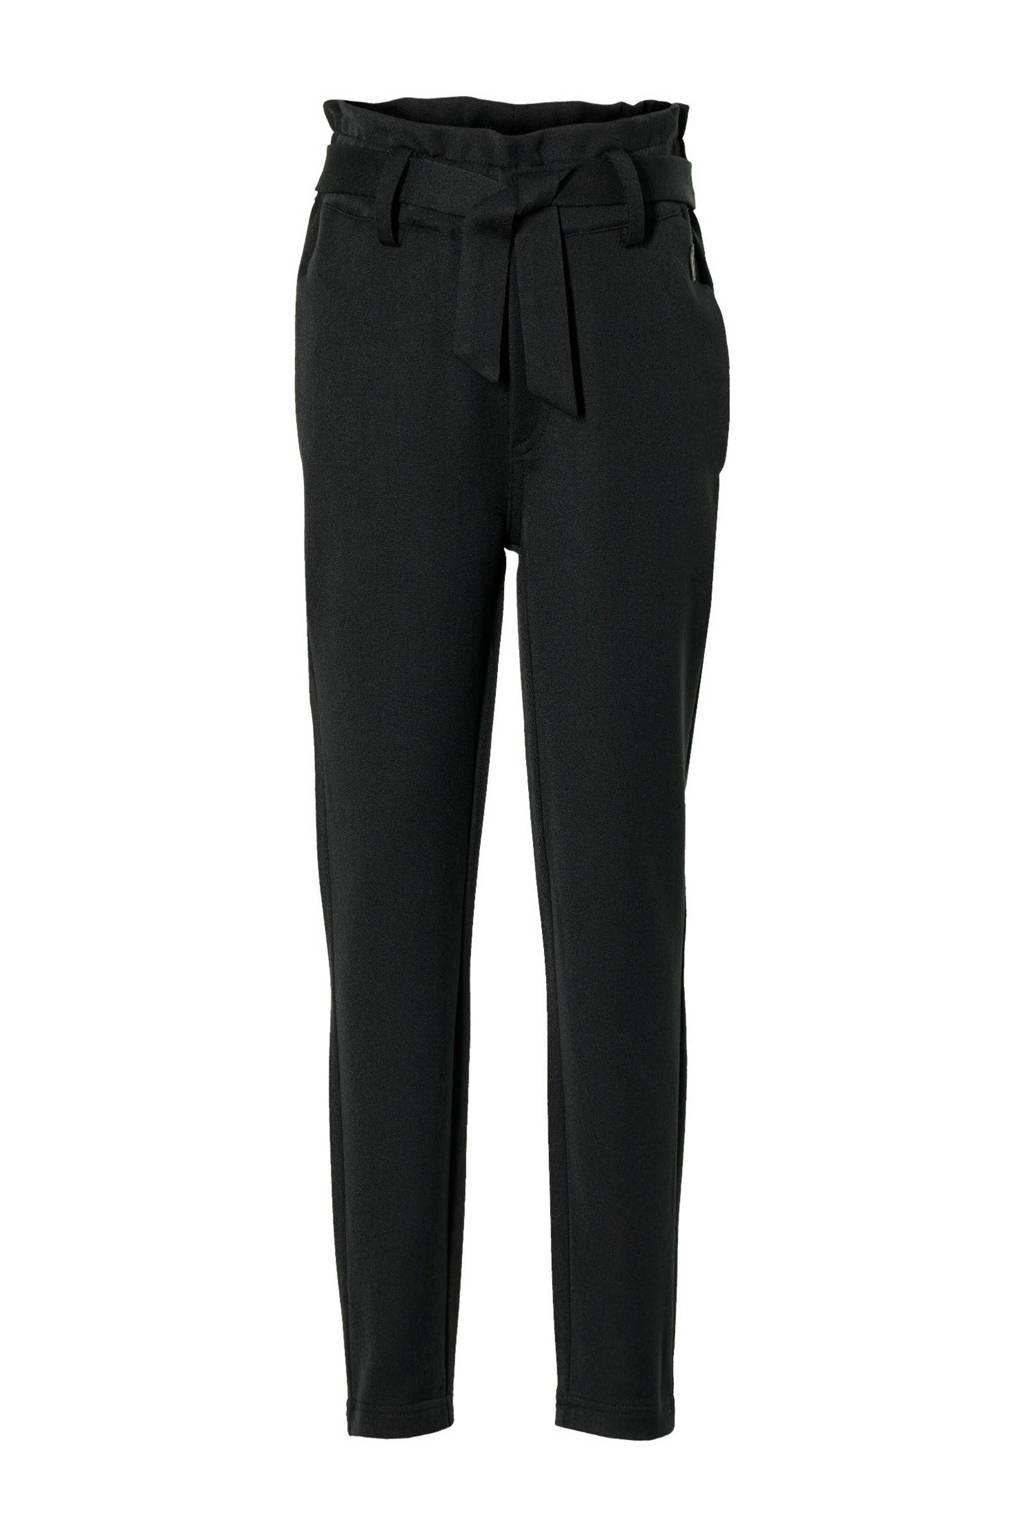 LEVV Girls regular fit broek Kensey zwart, Zwart